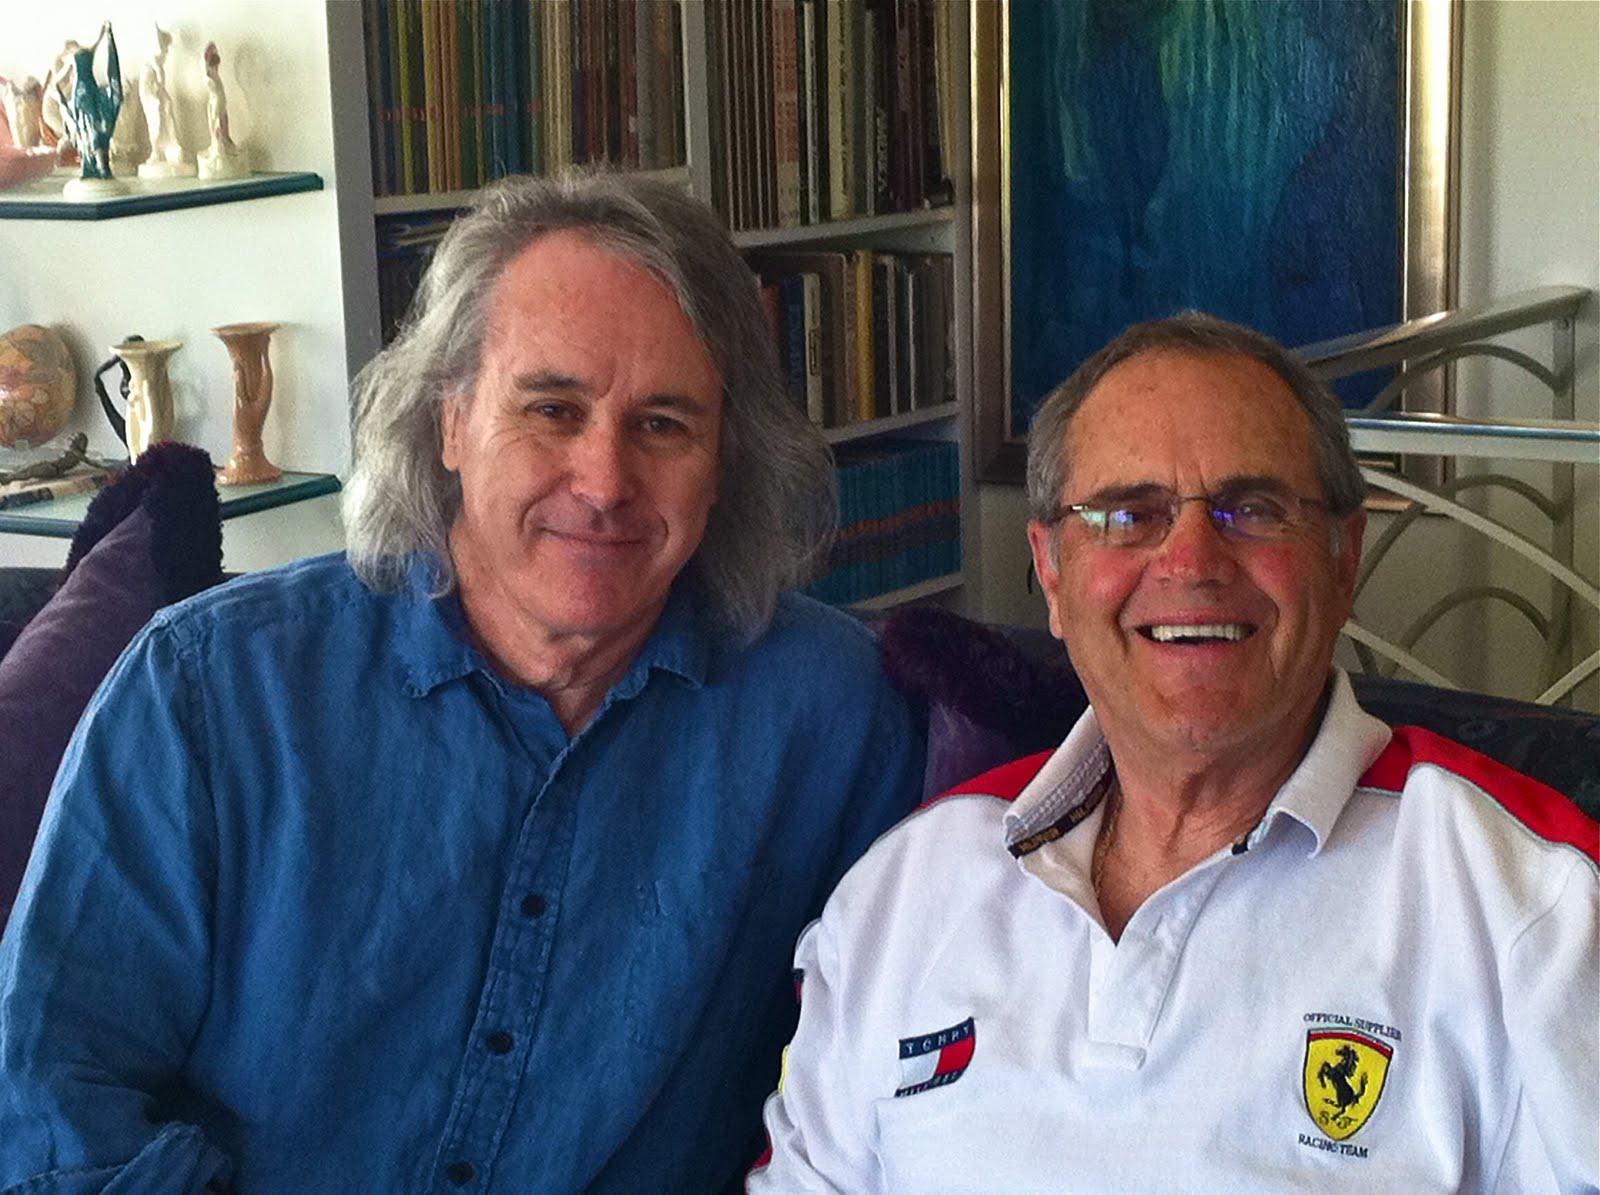 meeting Enzo Ferrari and